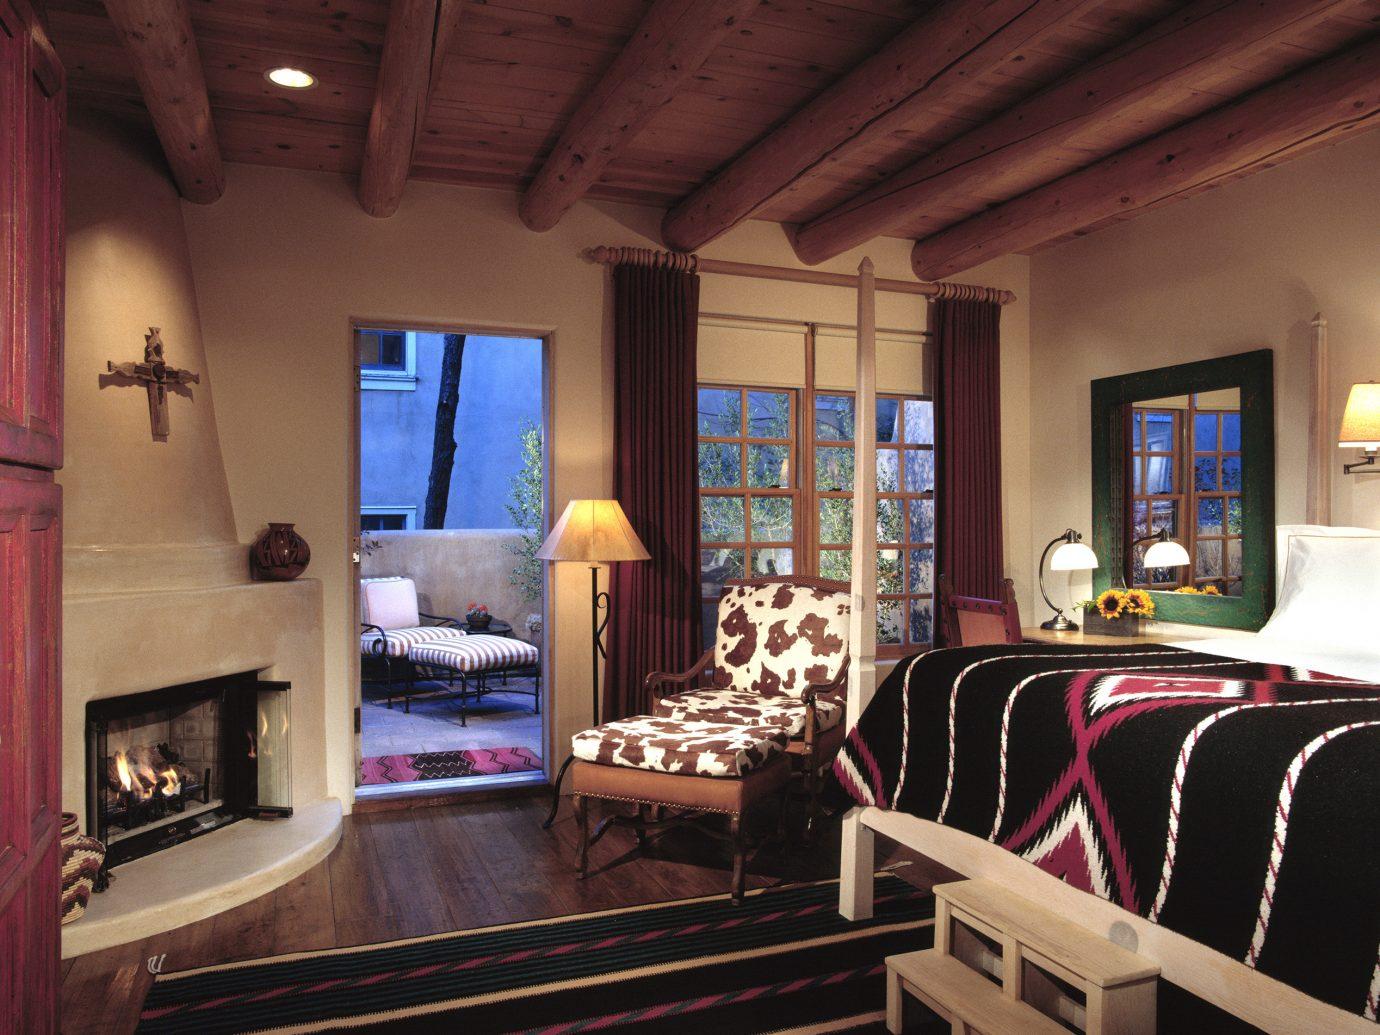 Bedroom at Rosewood Inn of the Anasazi